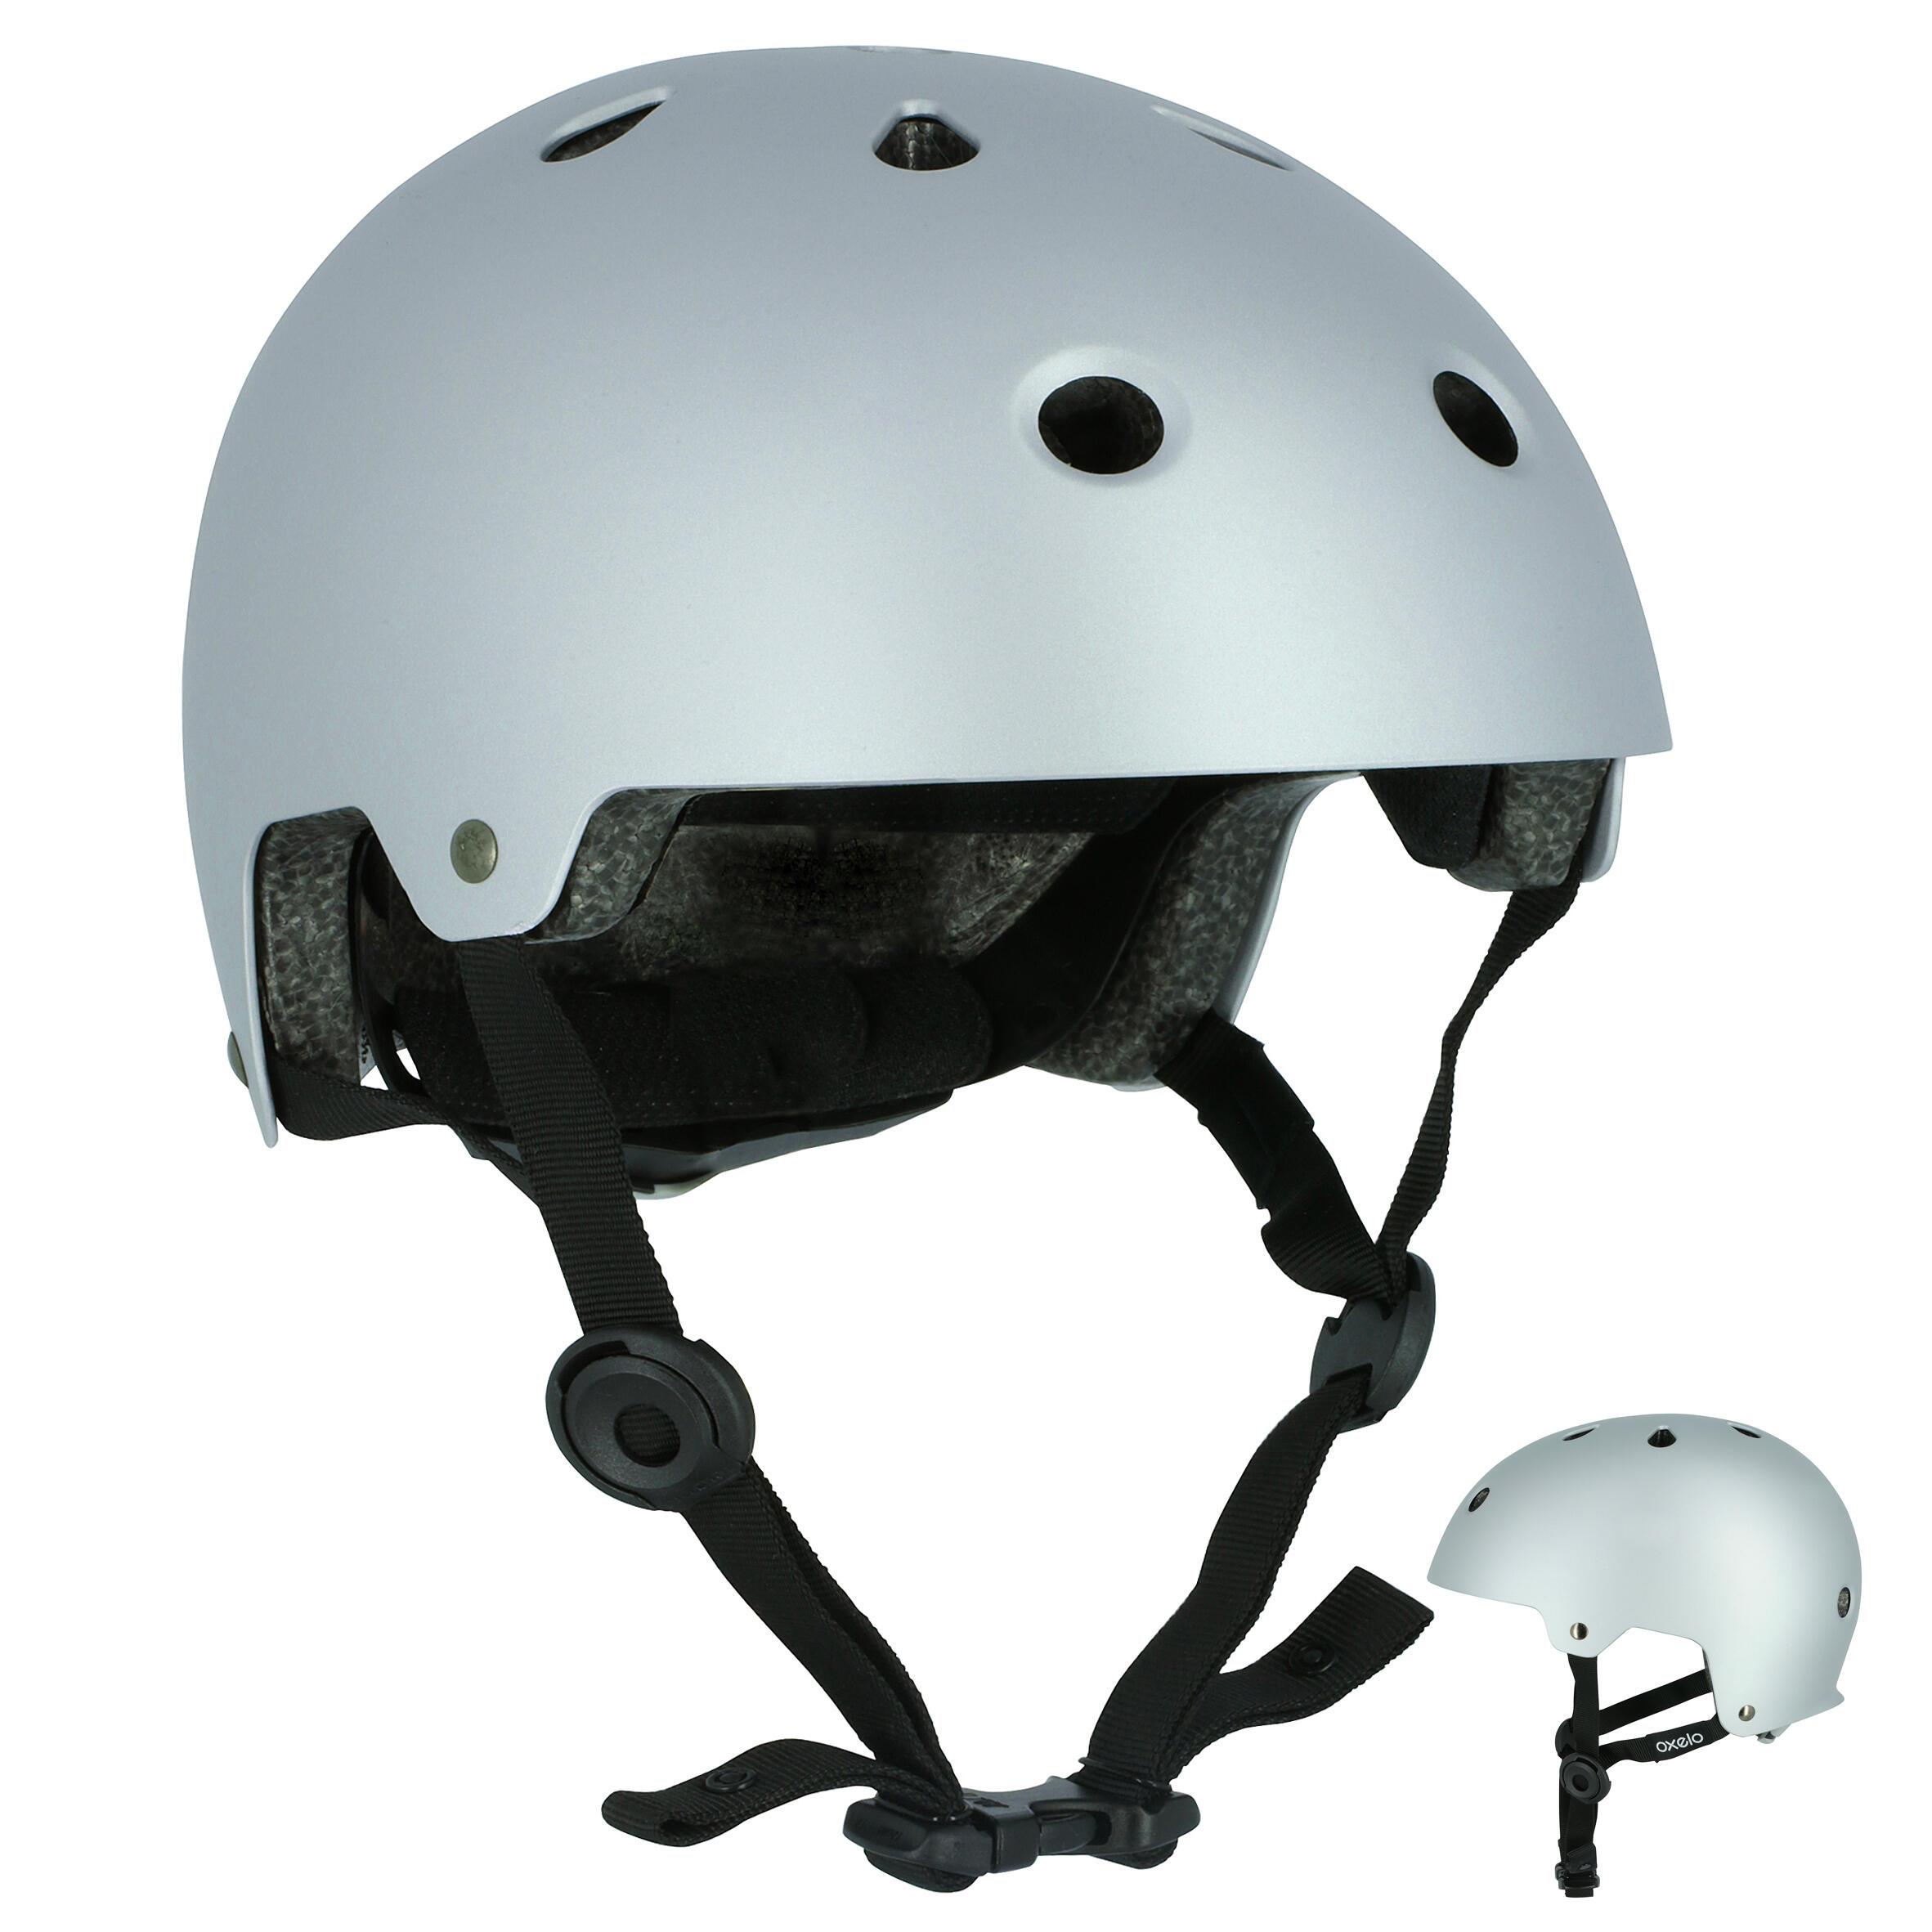 Casco para patines patineta patín del diablo bicicleta PLAY 5 gris